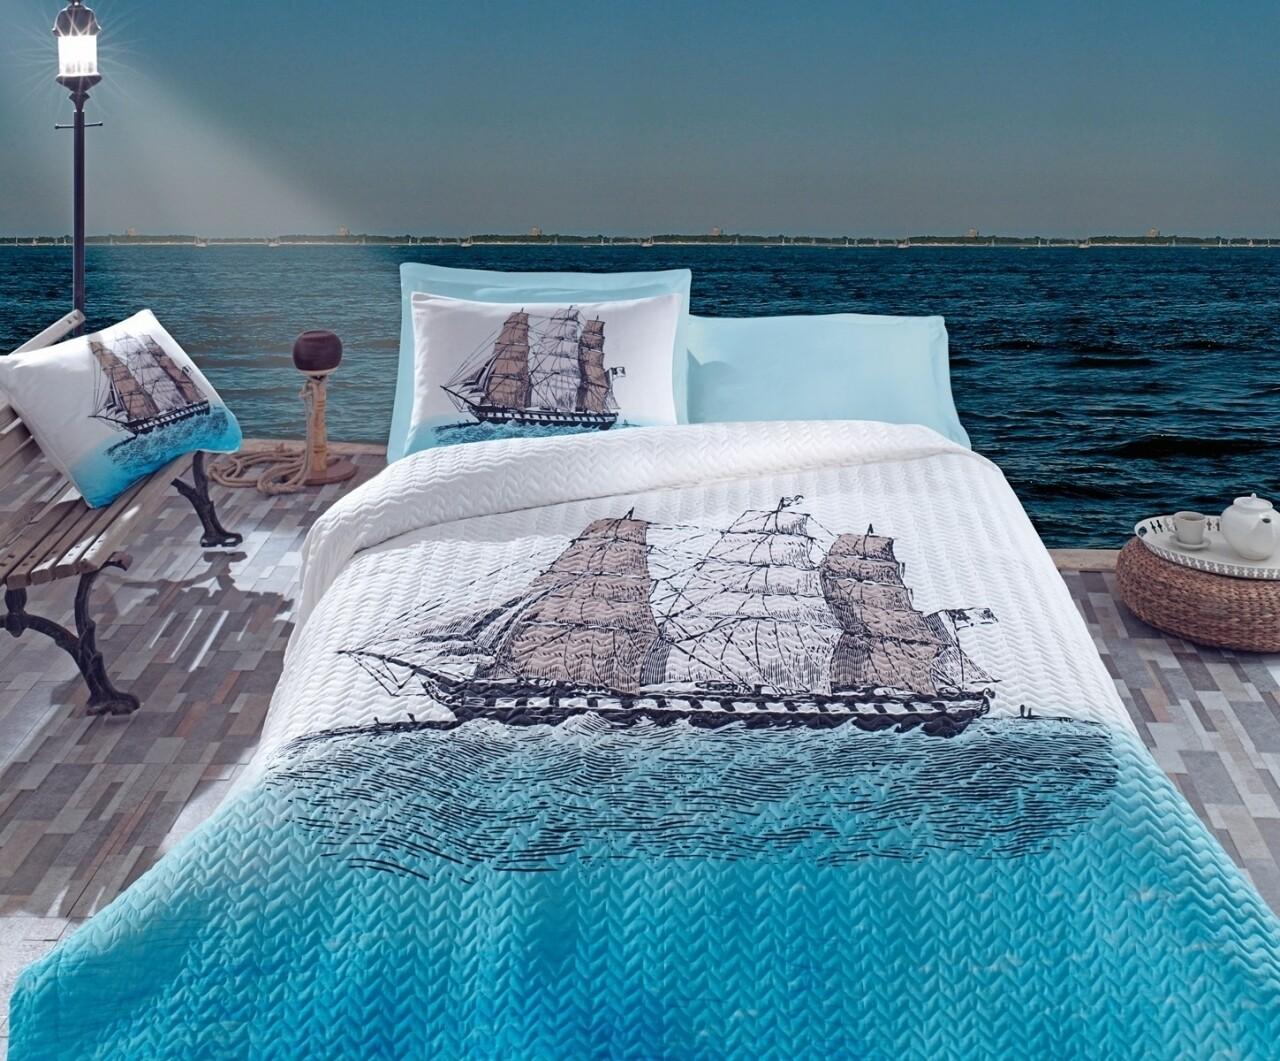 Lenjerie de pat matlasata pentru o persoana, 3 piese, 100% bumbac ranforce, Cotton Box, Ship Blue